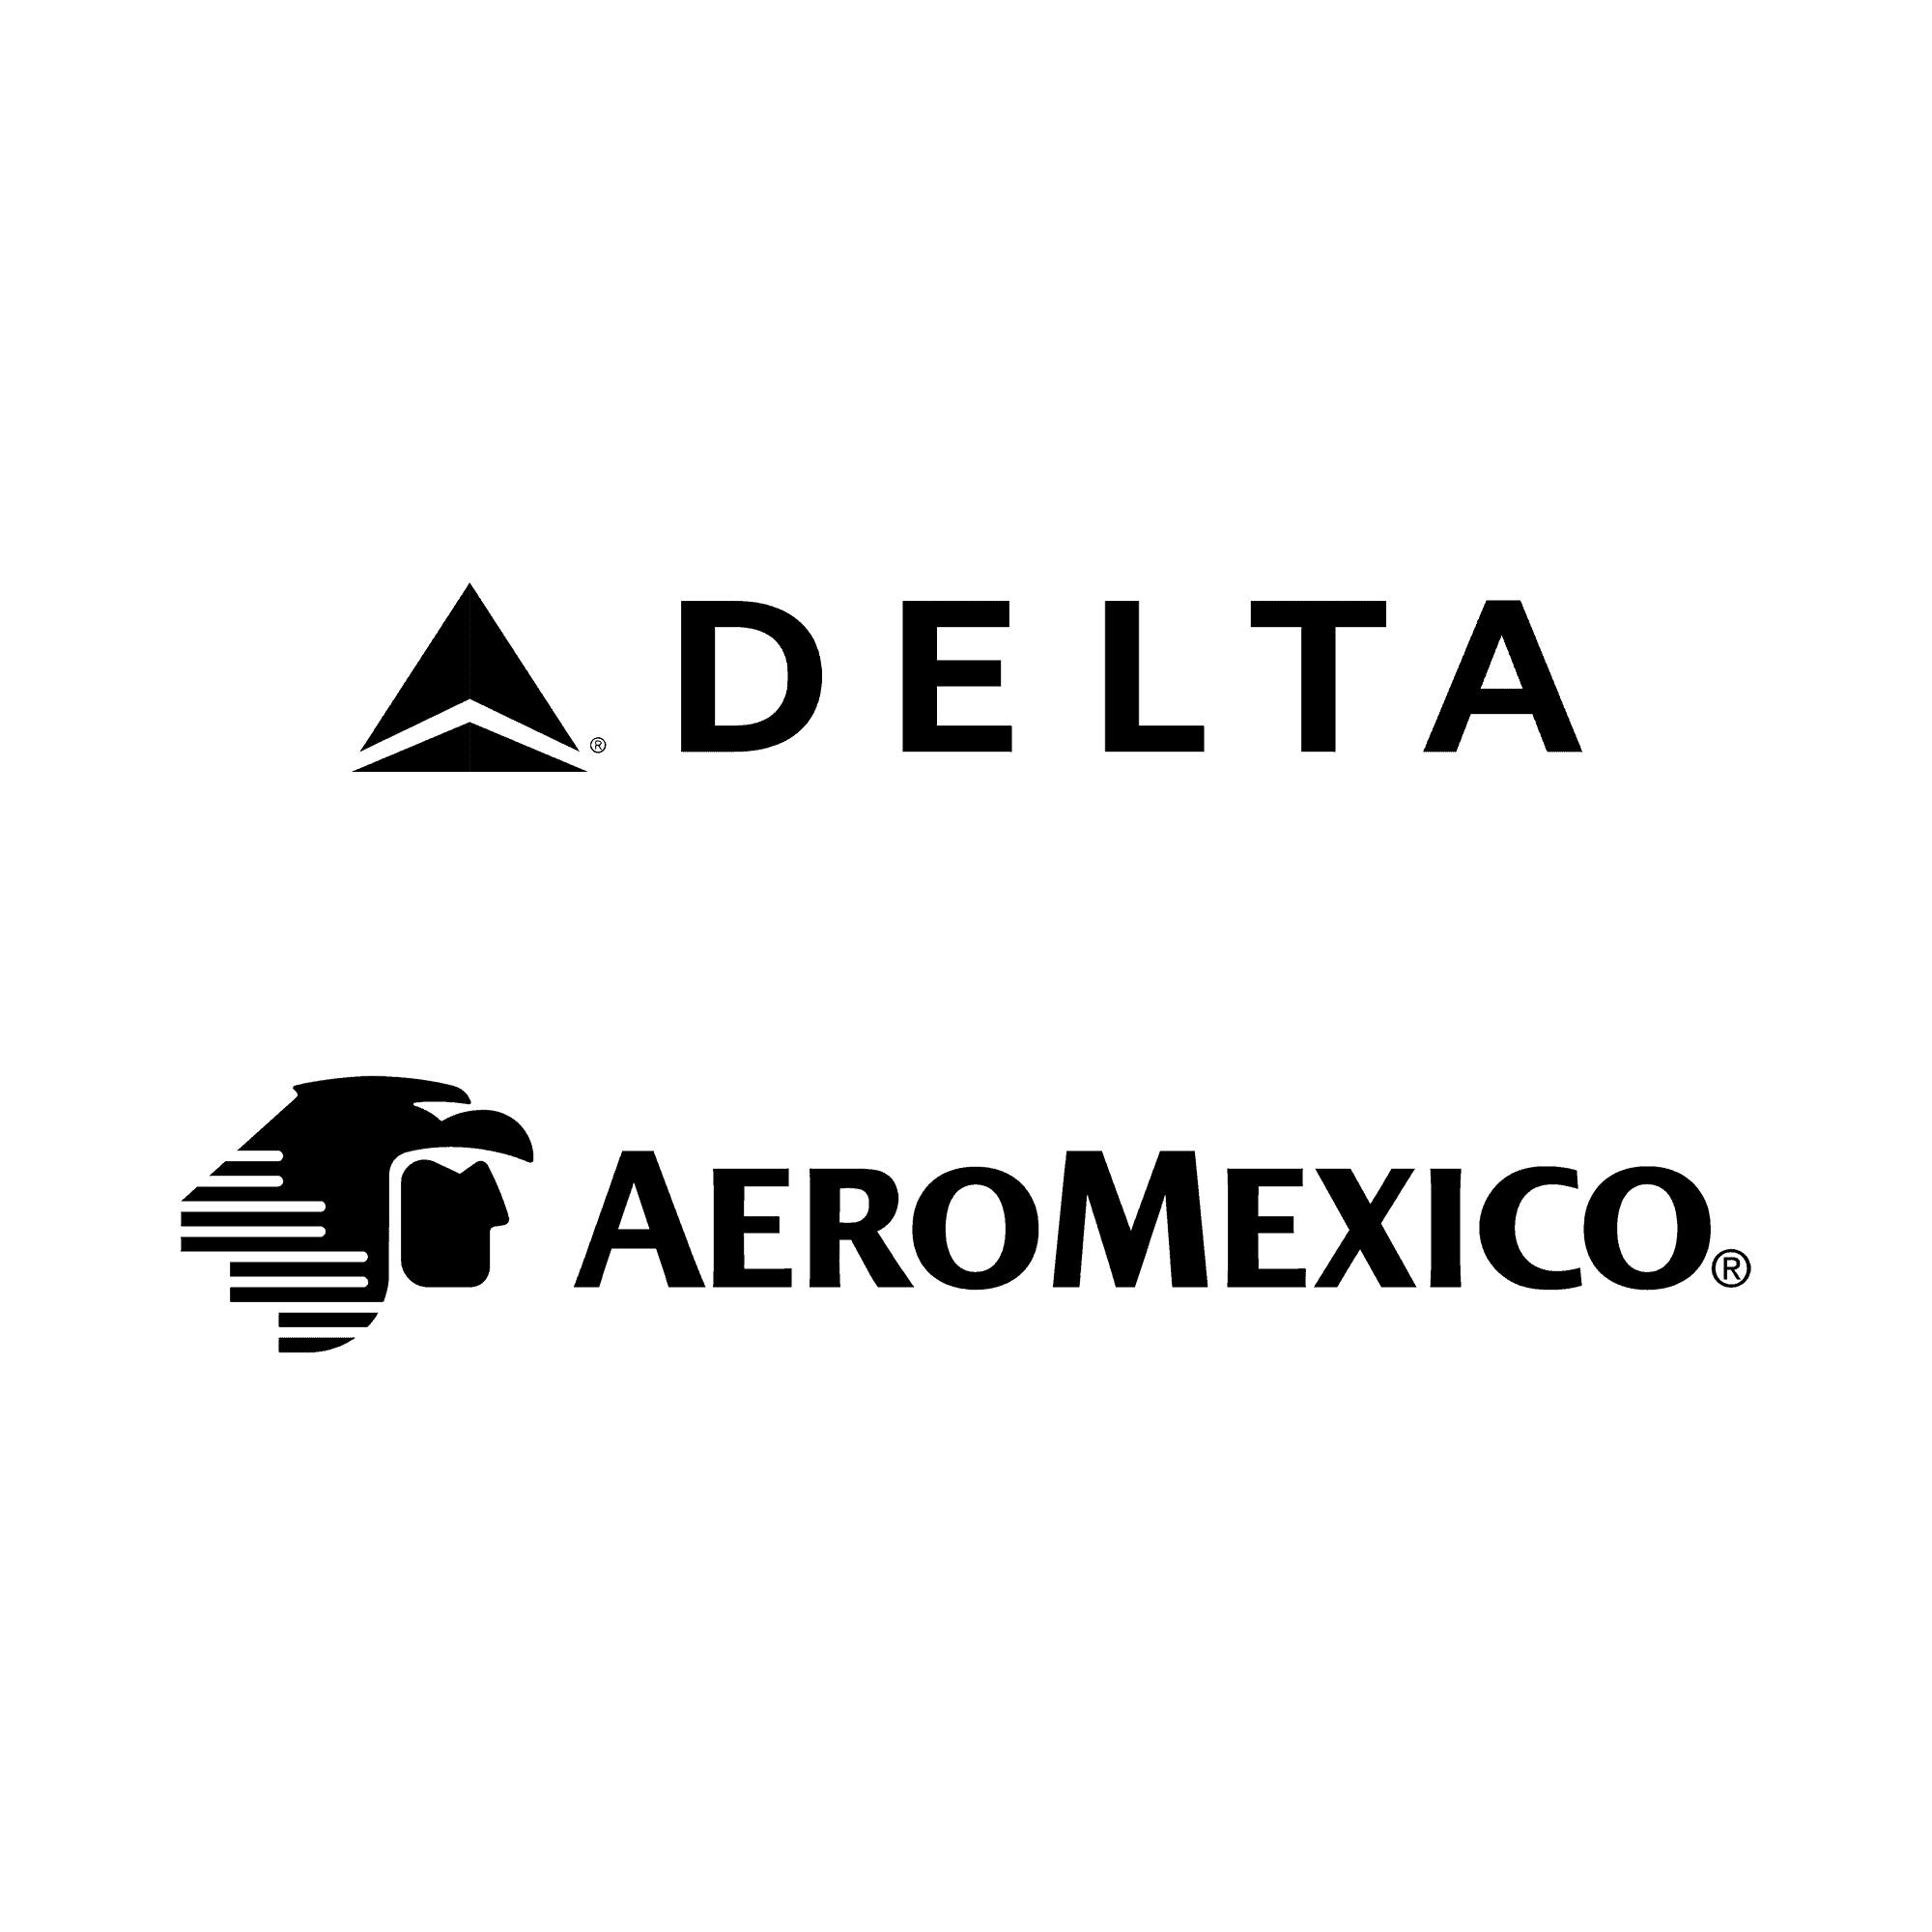 Delta & AeroMexico Logo